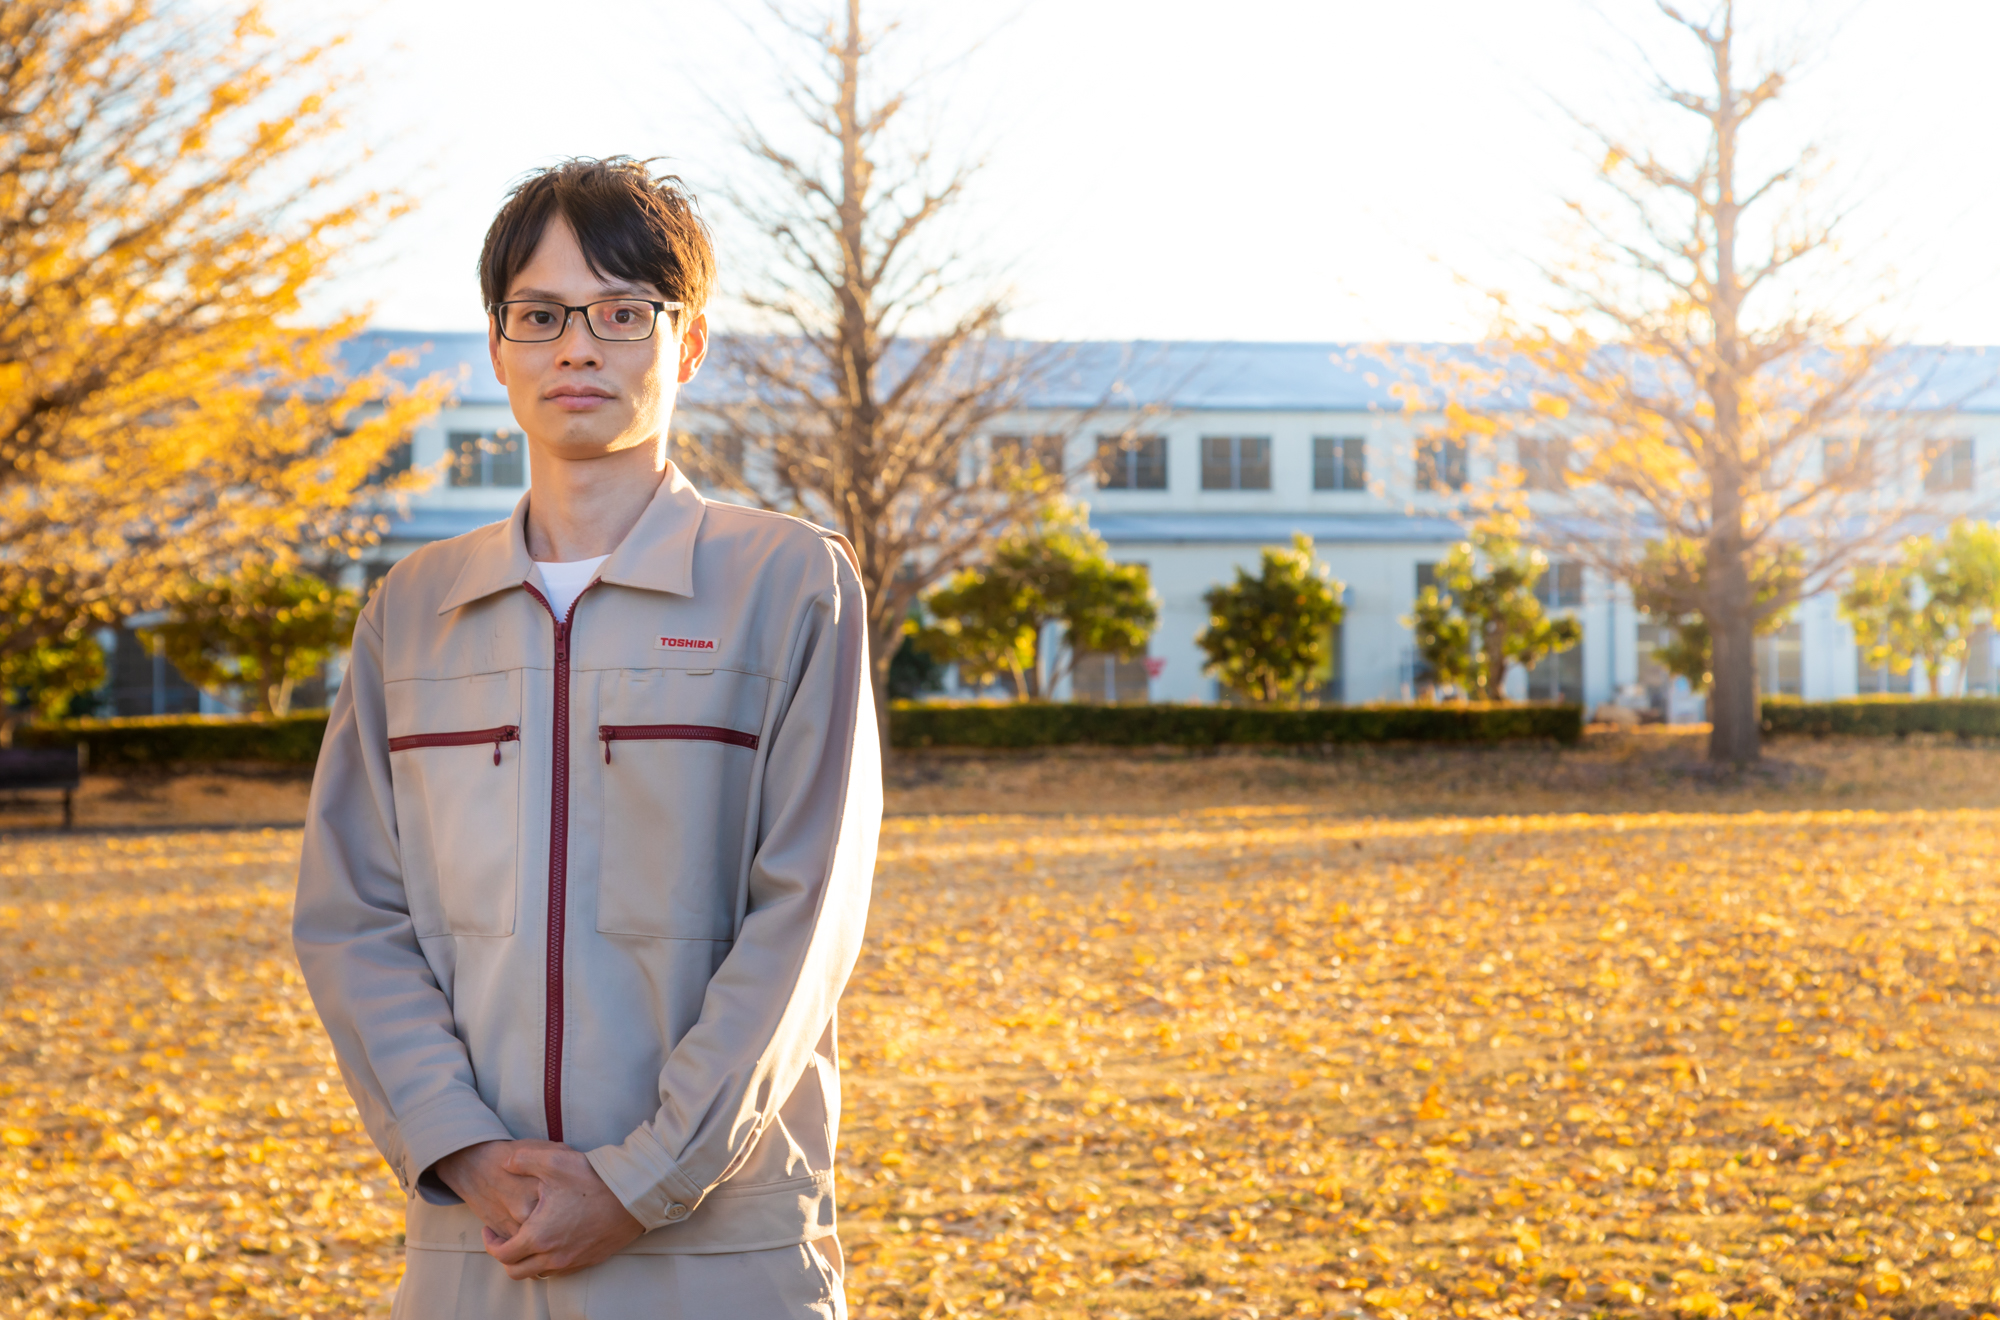 Masahiro Kurosu, Battery System Development Group 1, Battery System Development Department, Battery Division, Toshiba Corporation(3)